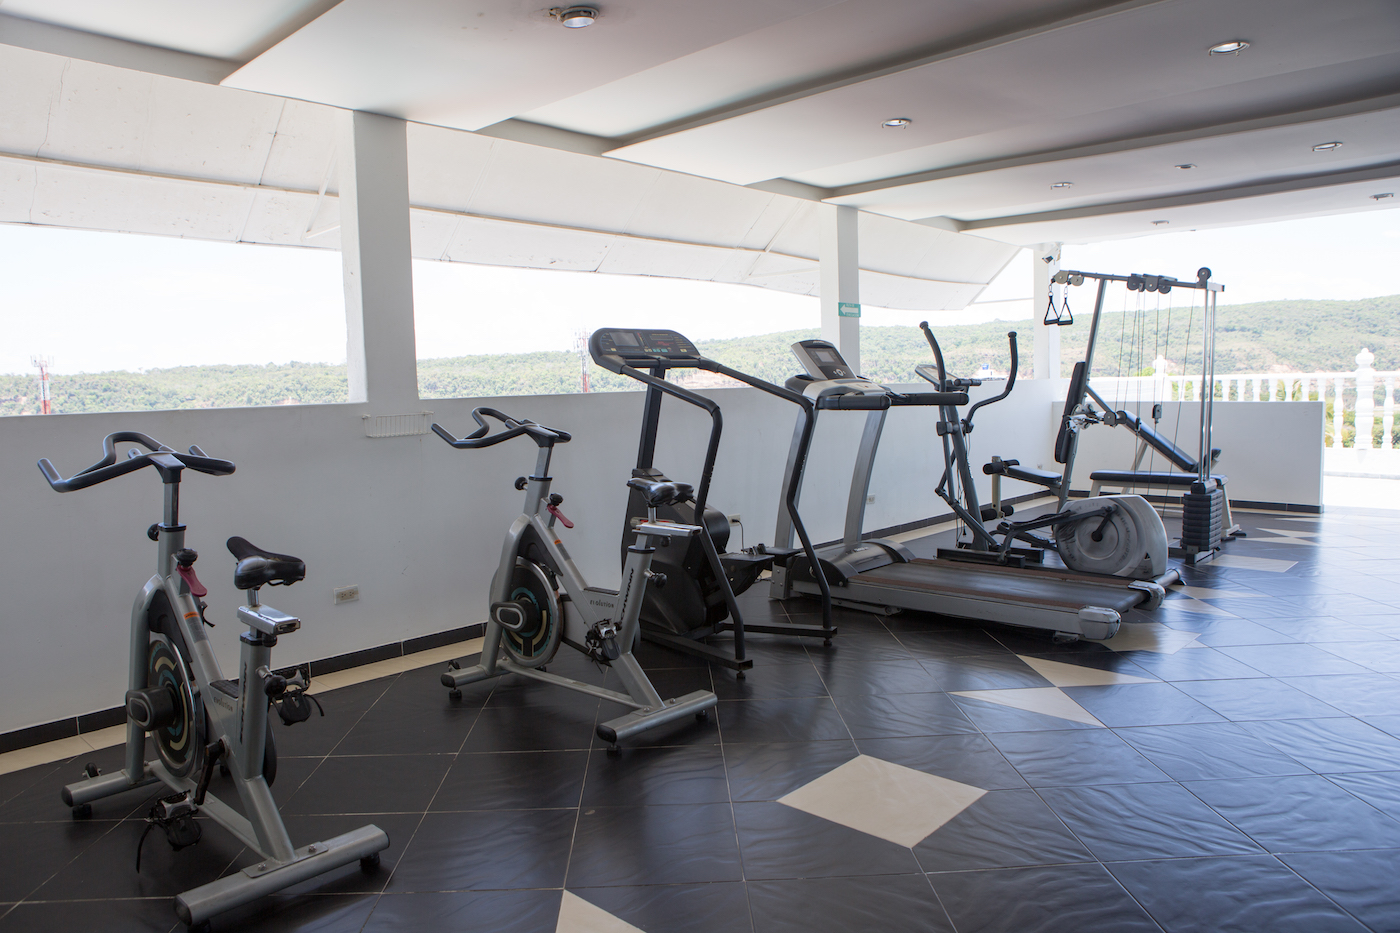 gimnasio-hotel-anamichu-suites